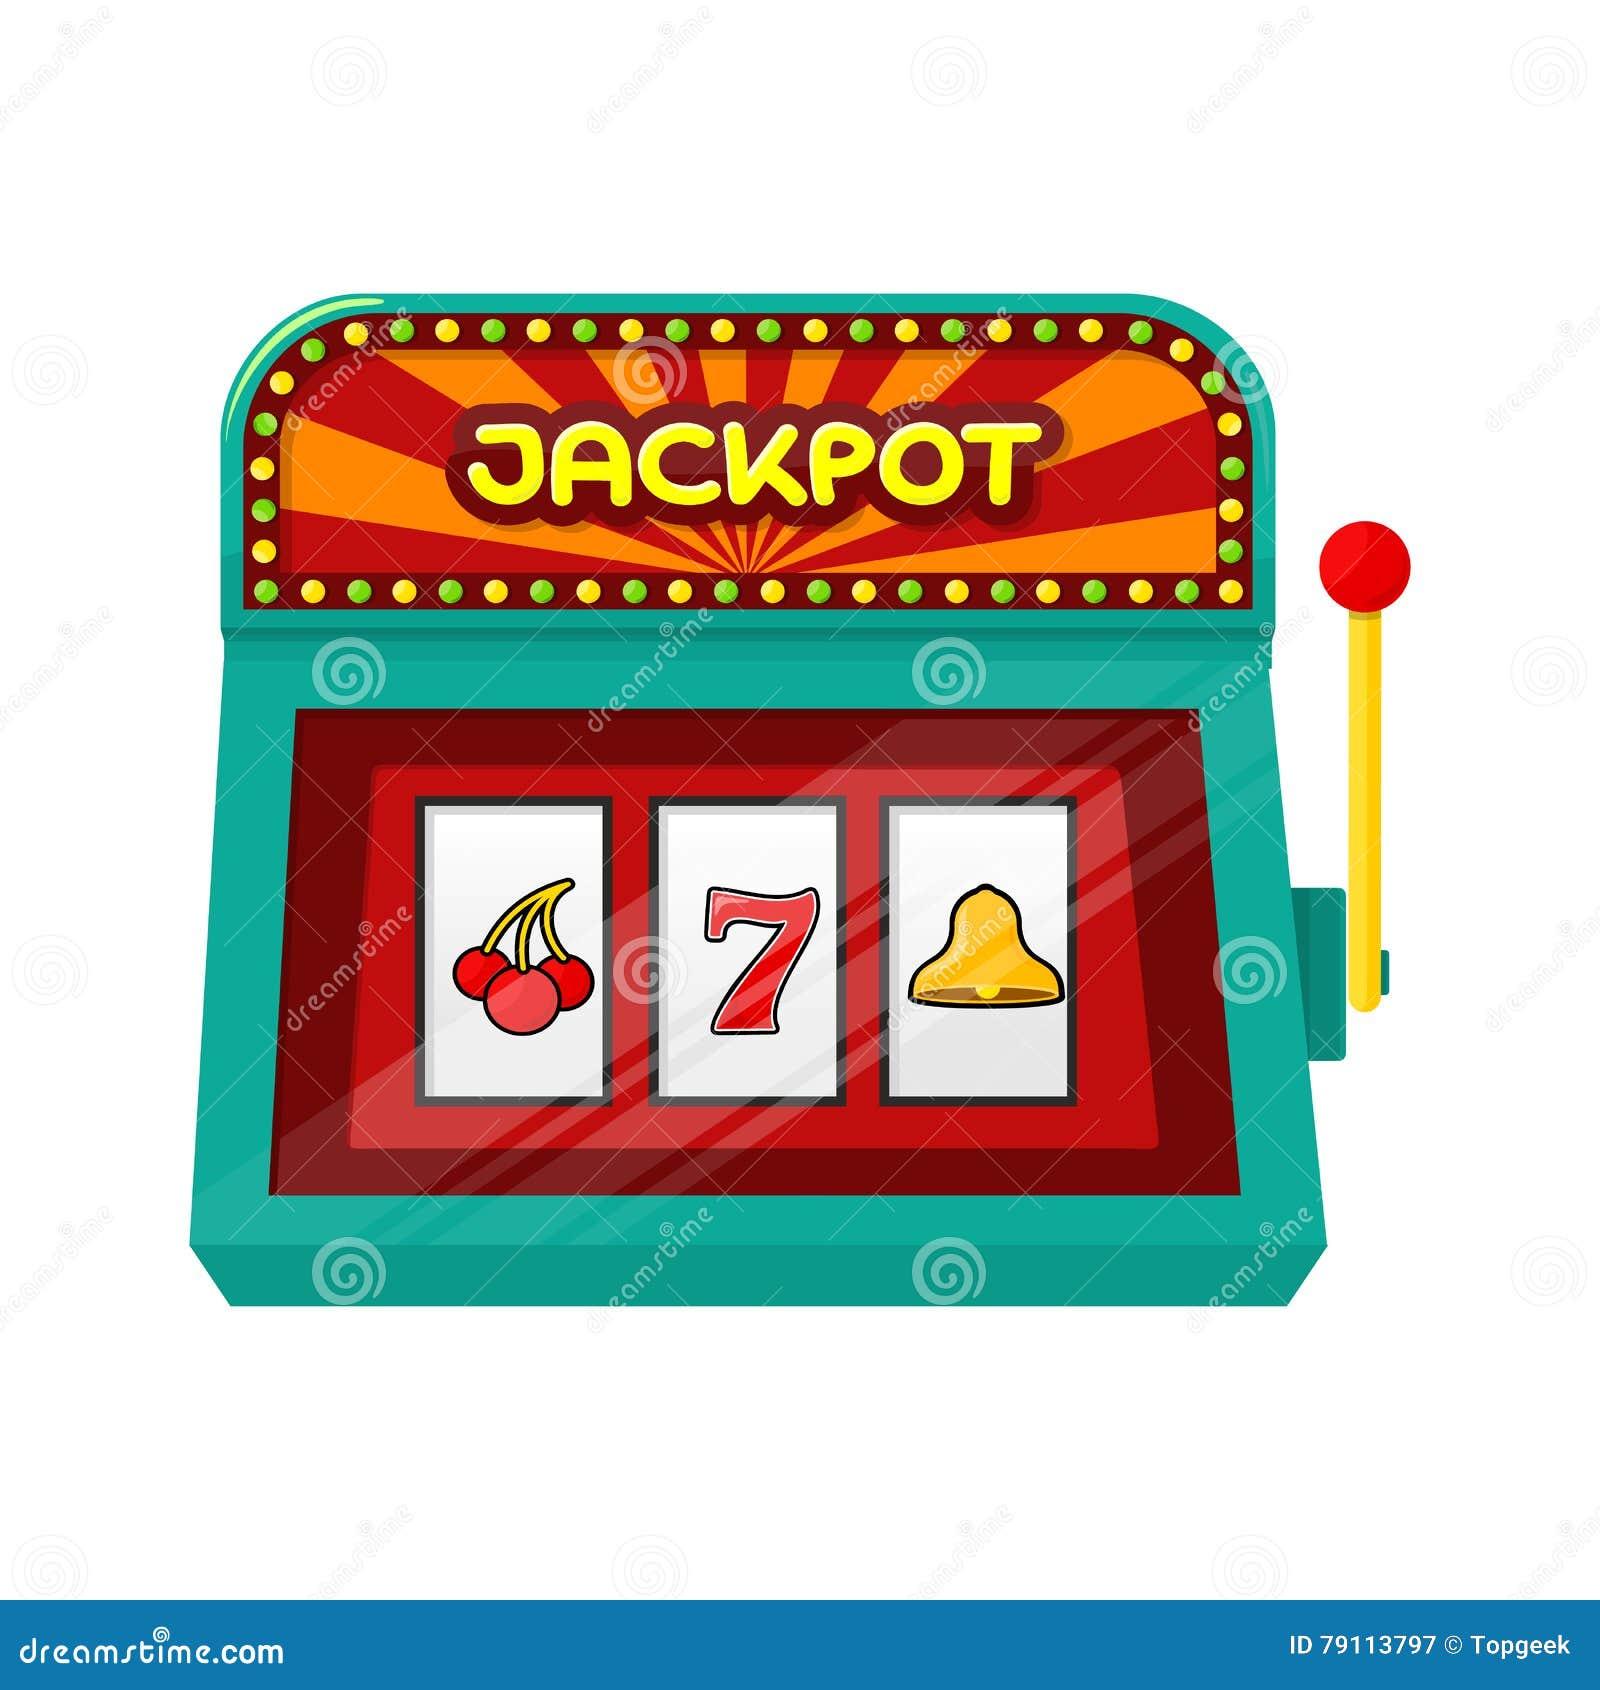 Webs free slot machines bears den at seneca niagara casino & hotel